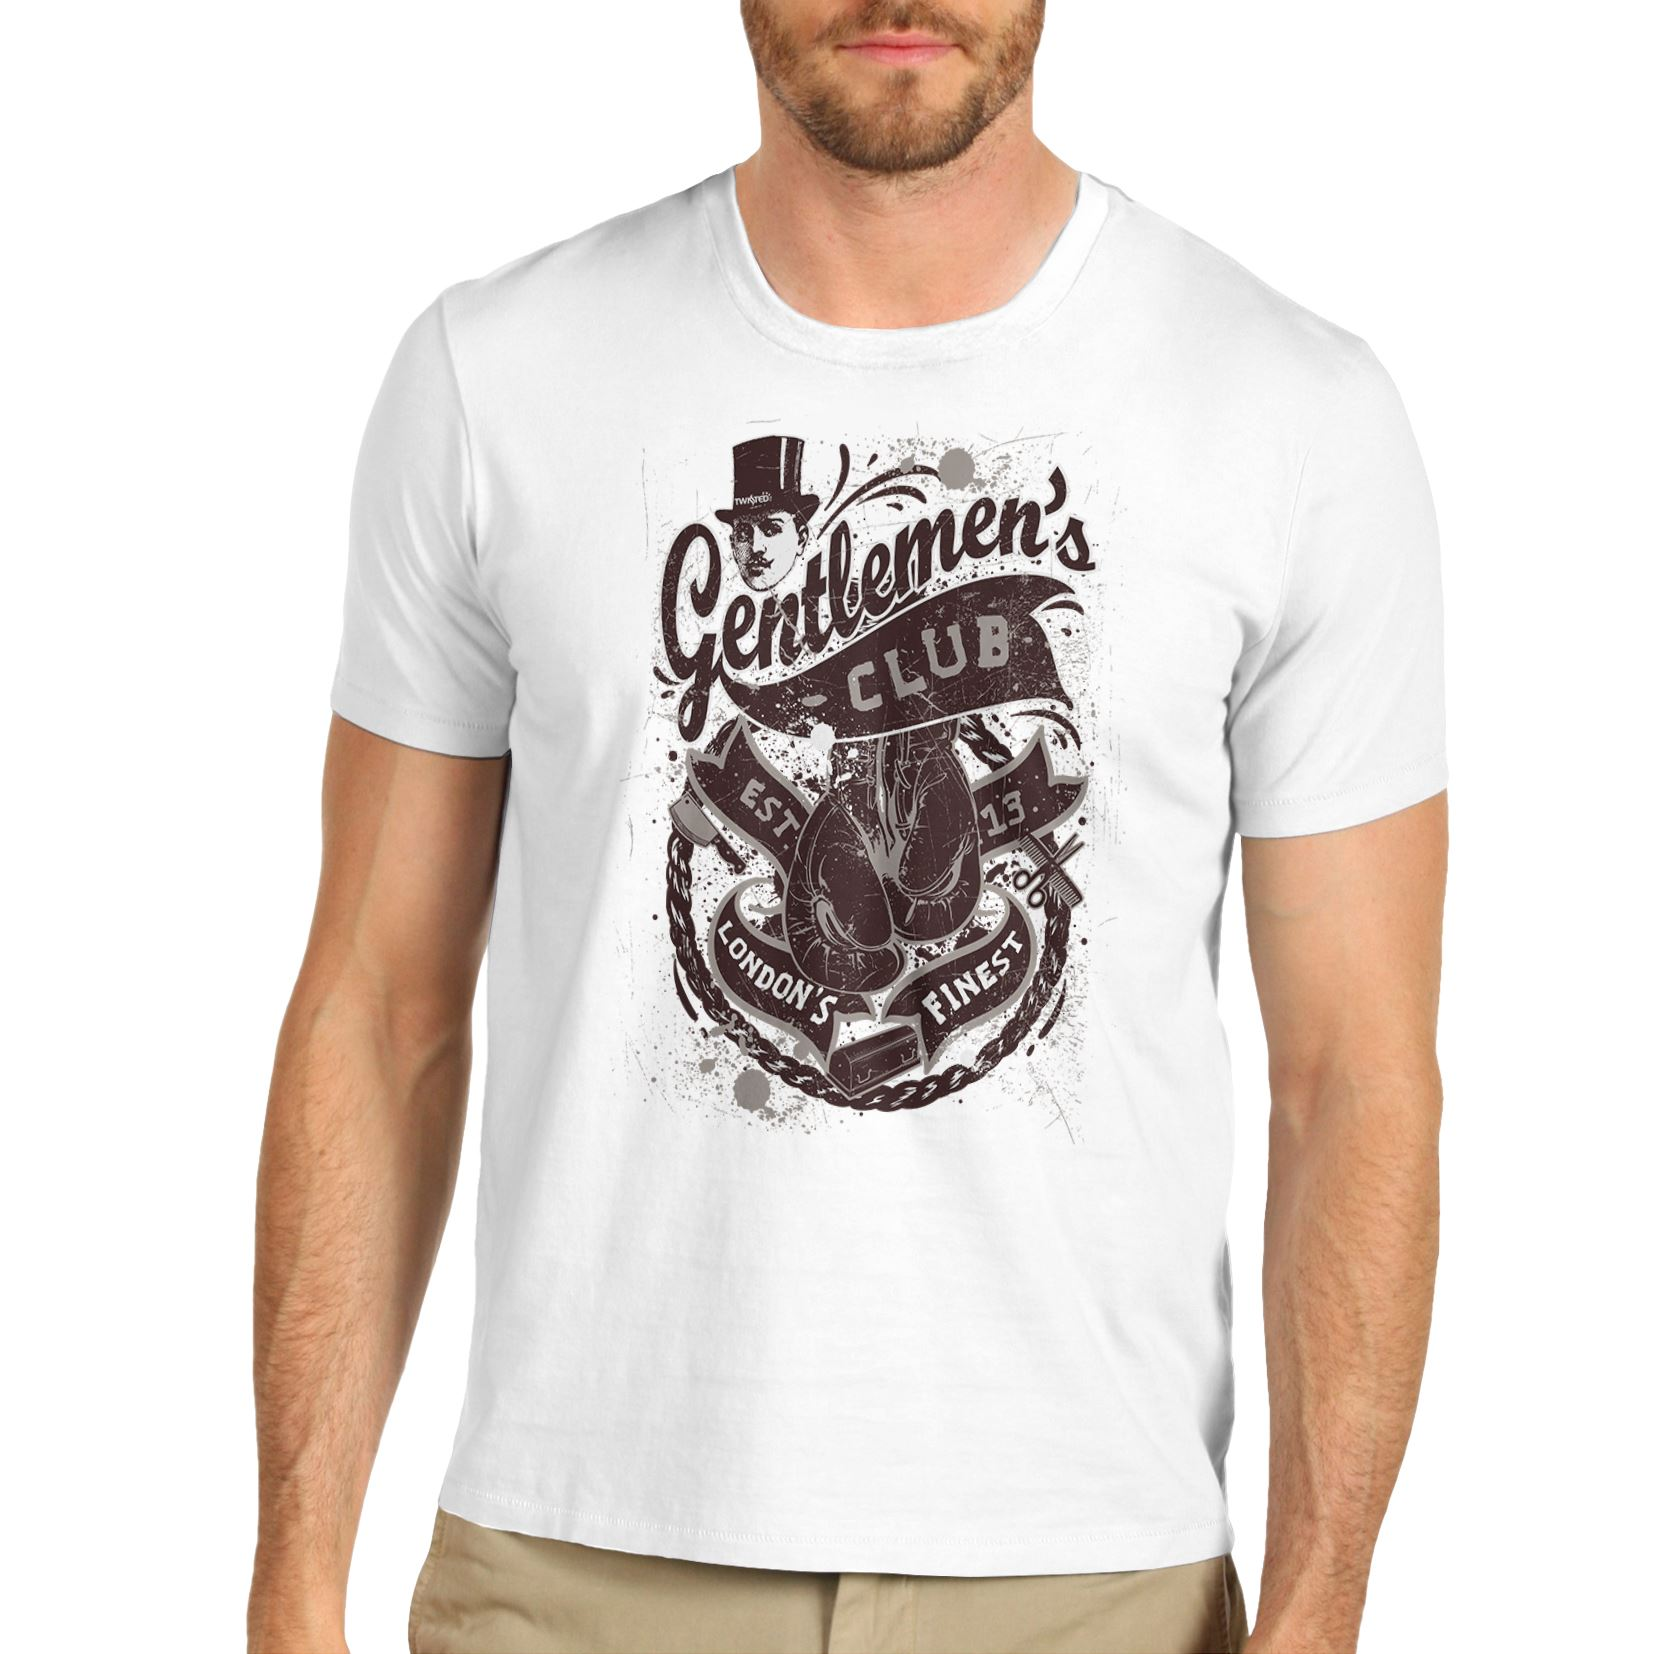 Men/'s Premium Cotton London Gentlemen/'s Club T-Shirt